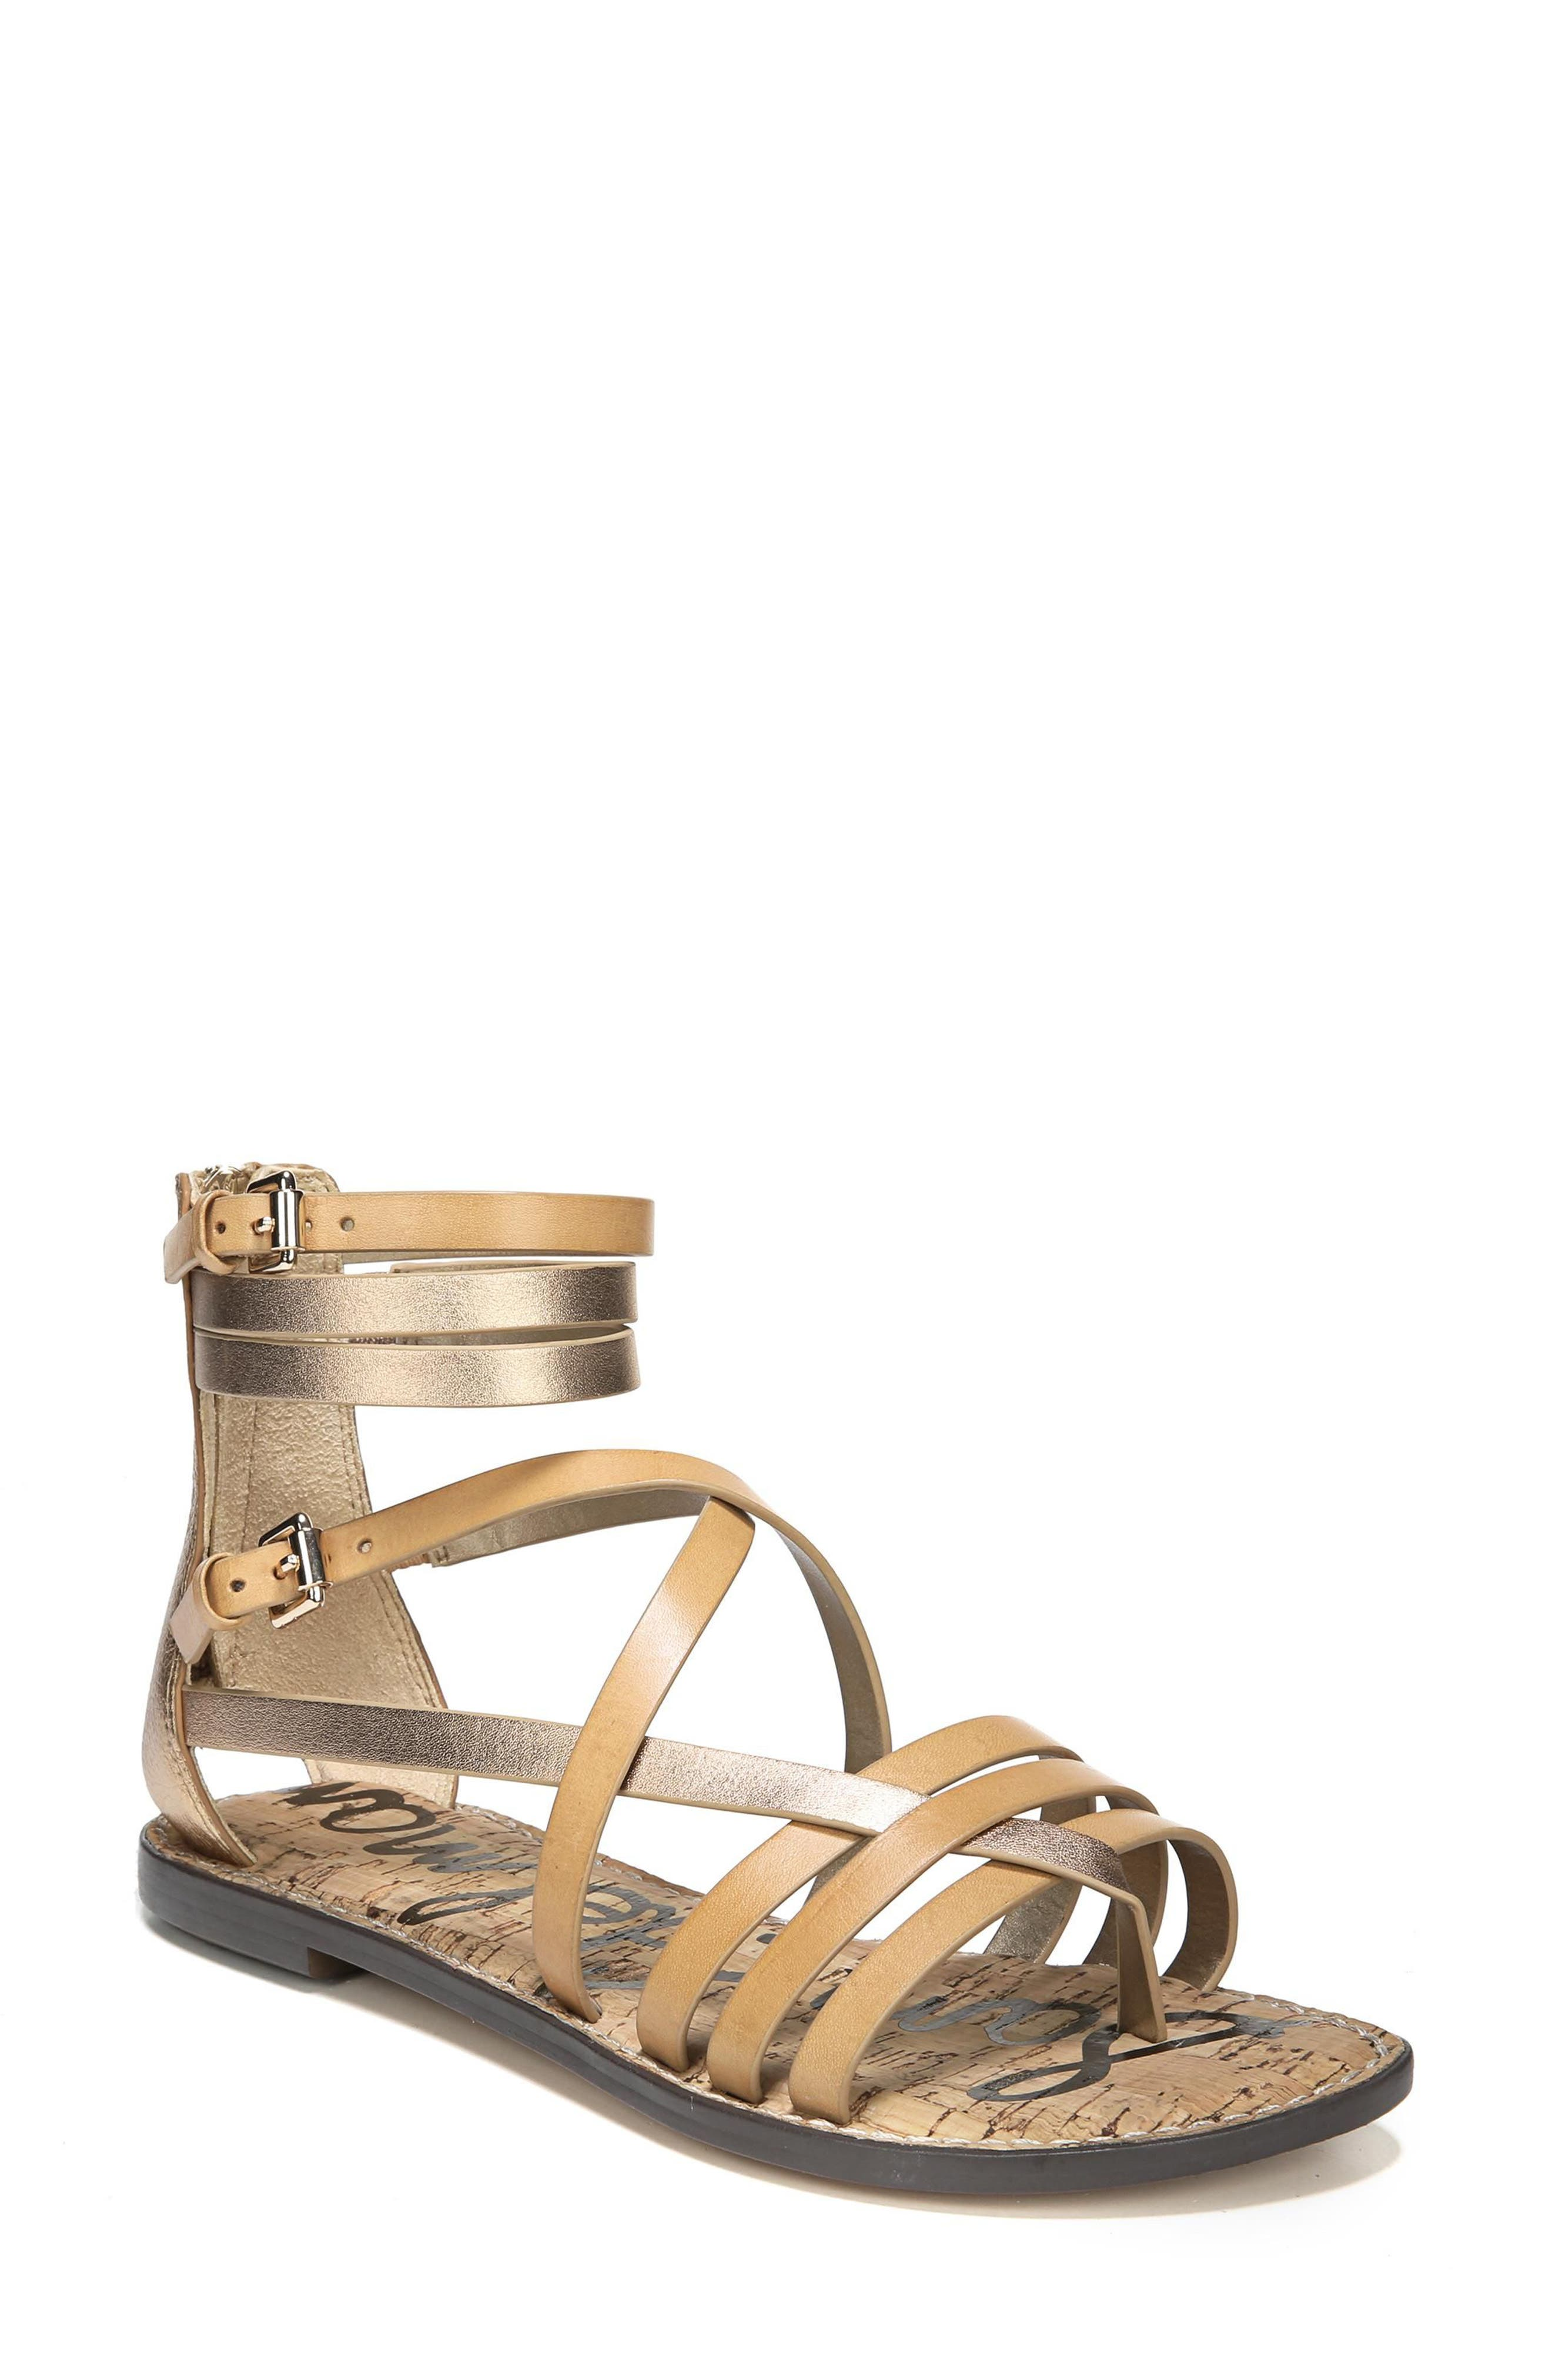 Ganesa Strappy Sandal,                             Main thumbnail 1, color,                             Golden Caramel Leather